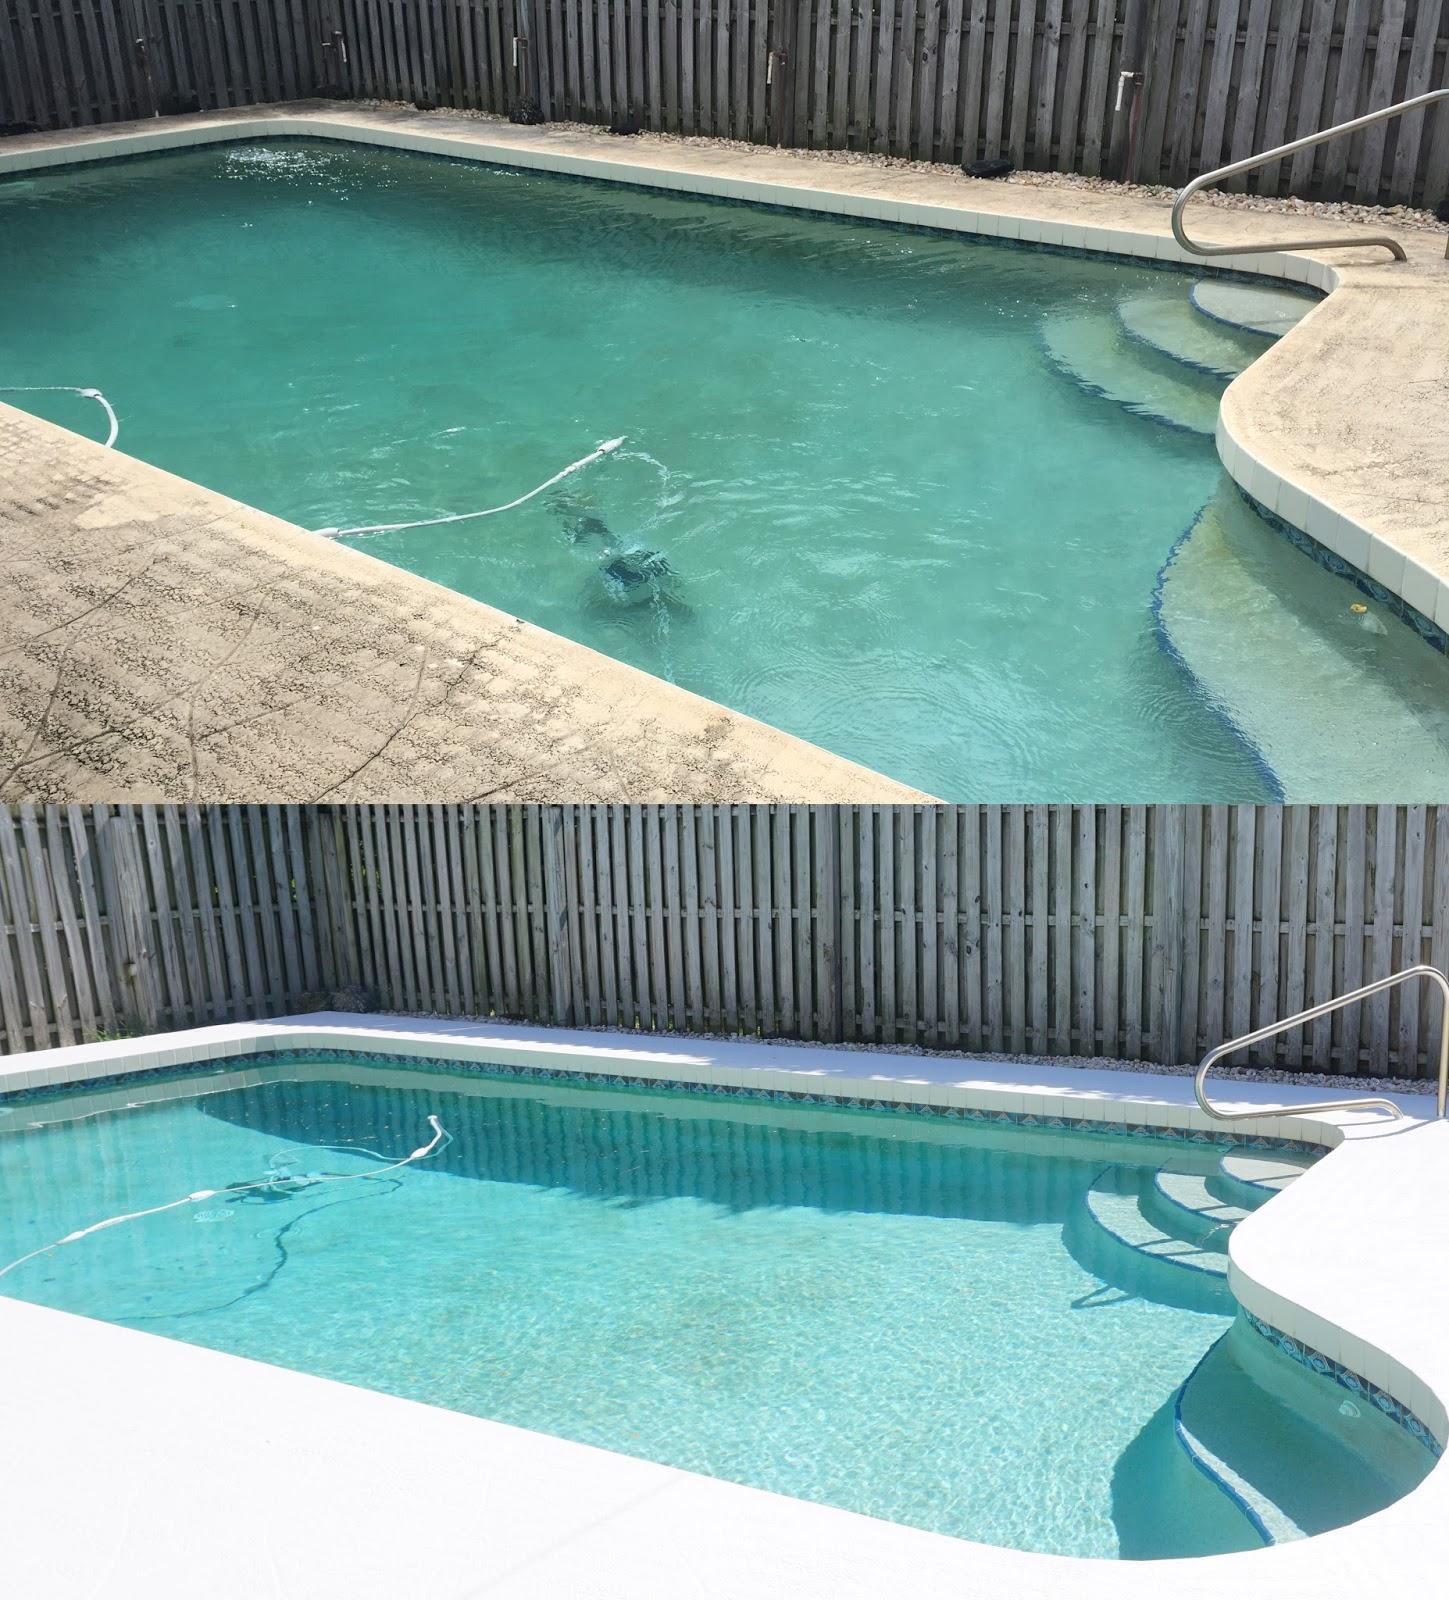 lorraine stanick how to improve pool deck behr. Black Bedroom Furniture Sets. Home Design Ideas